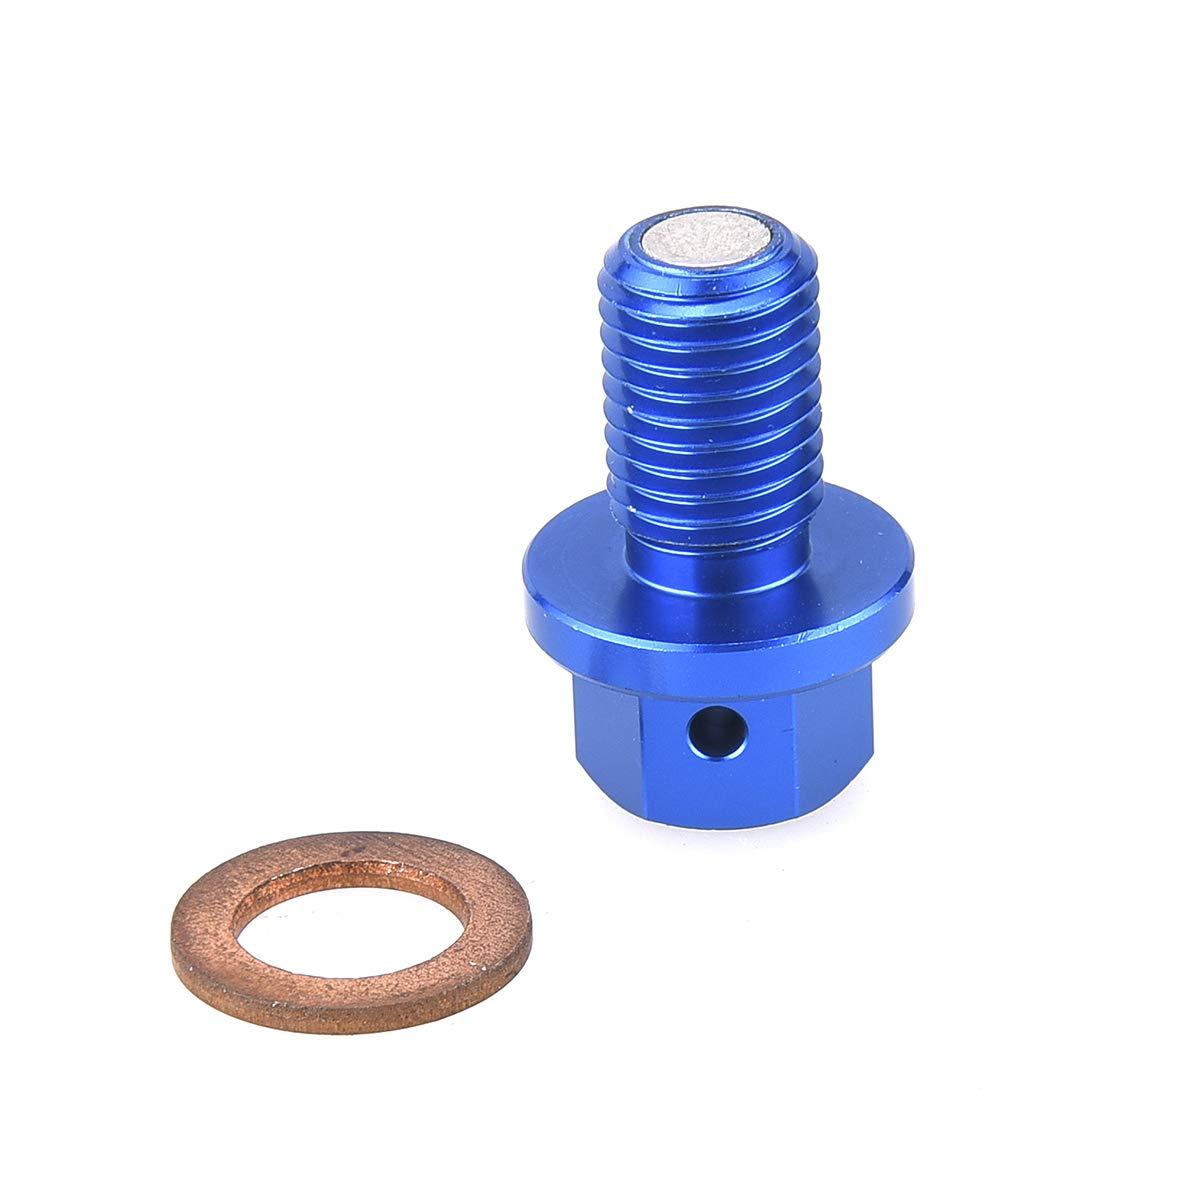 JFG RACING Blue CNC Aluminum M10x1.25 Frame Magnetic Oil Drain Plug Bolt For Yamaha YZ125 YZ250F YZ450F YZ250FX WR250F WR450F